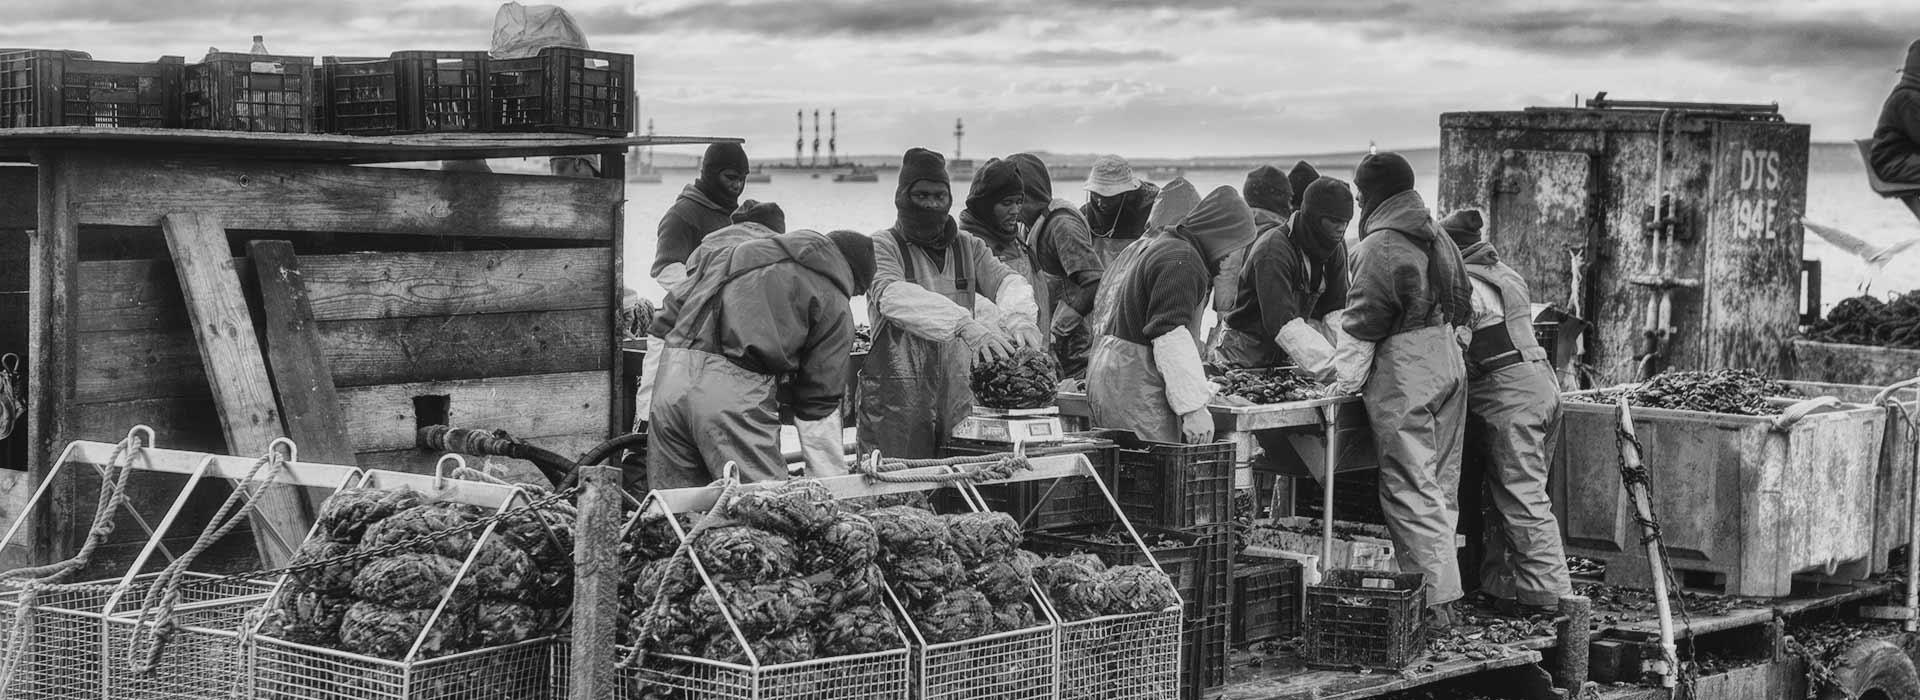 blue-ocean-mussels-workers-boat